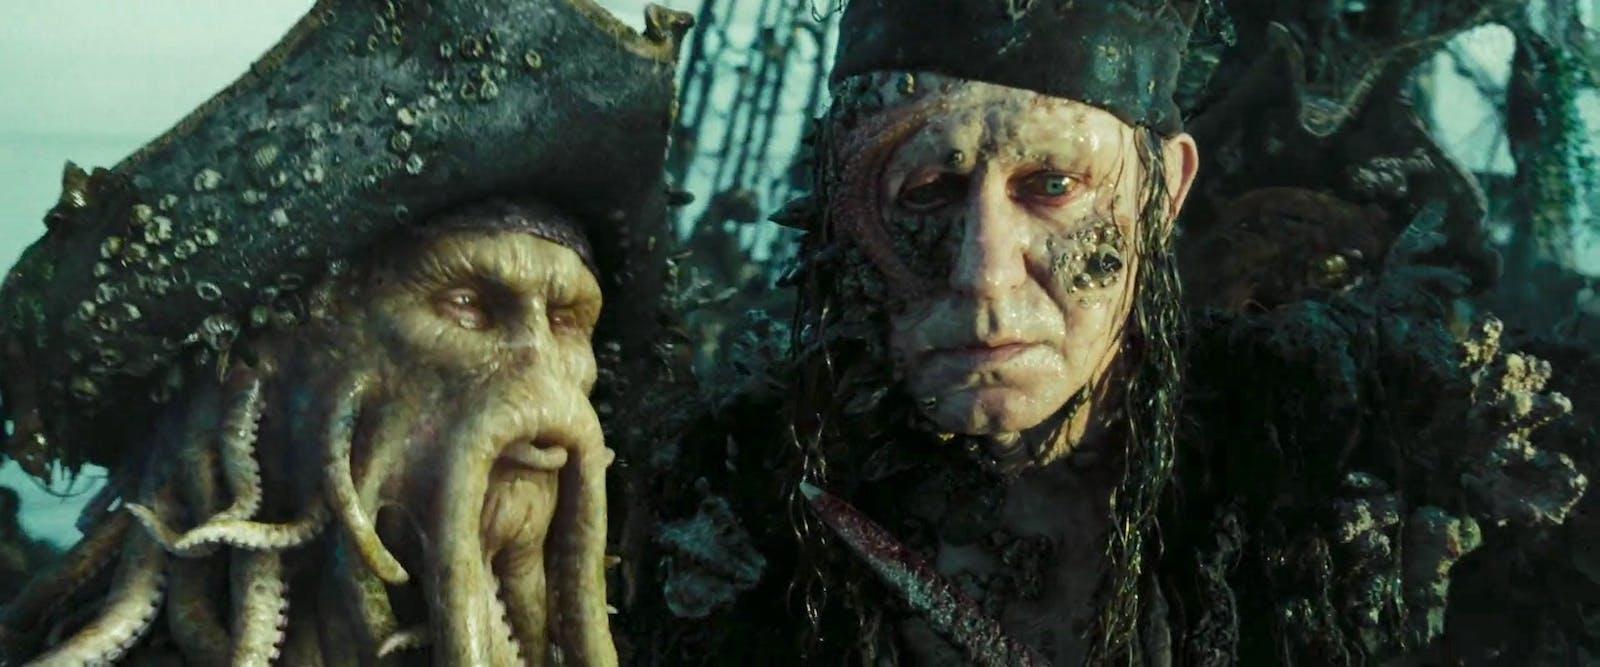 Pirates of Caribbean.